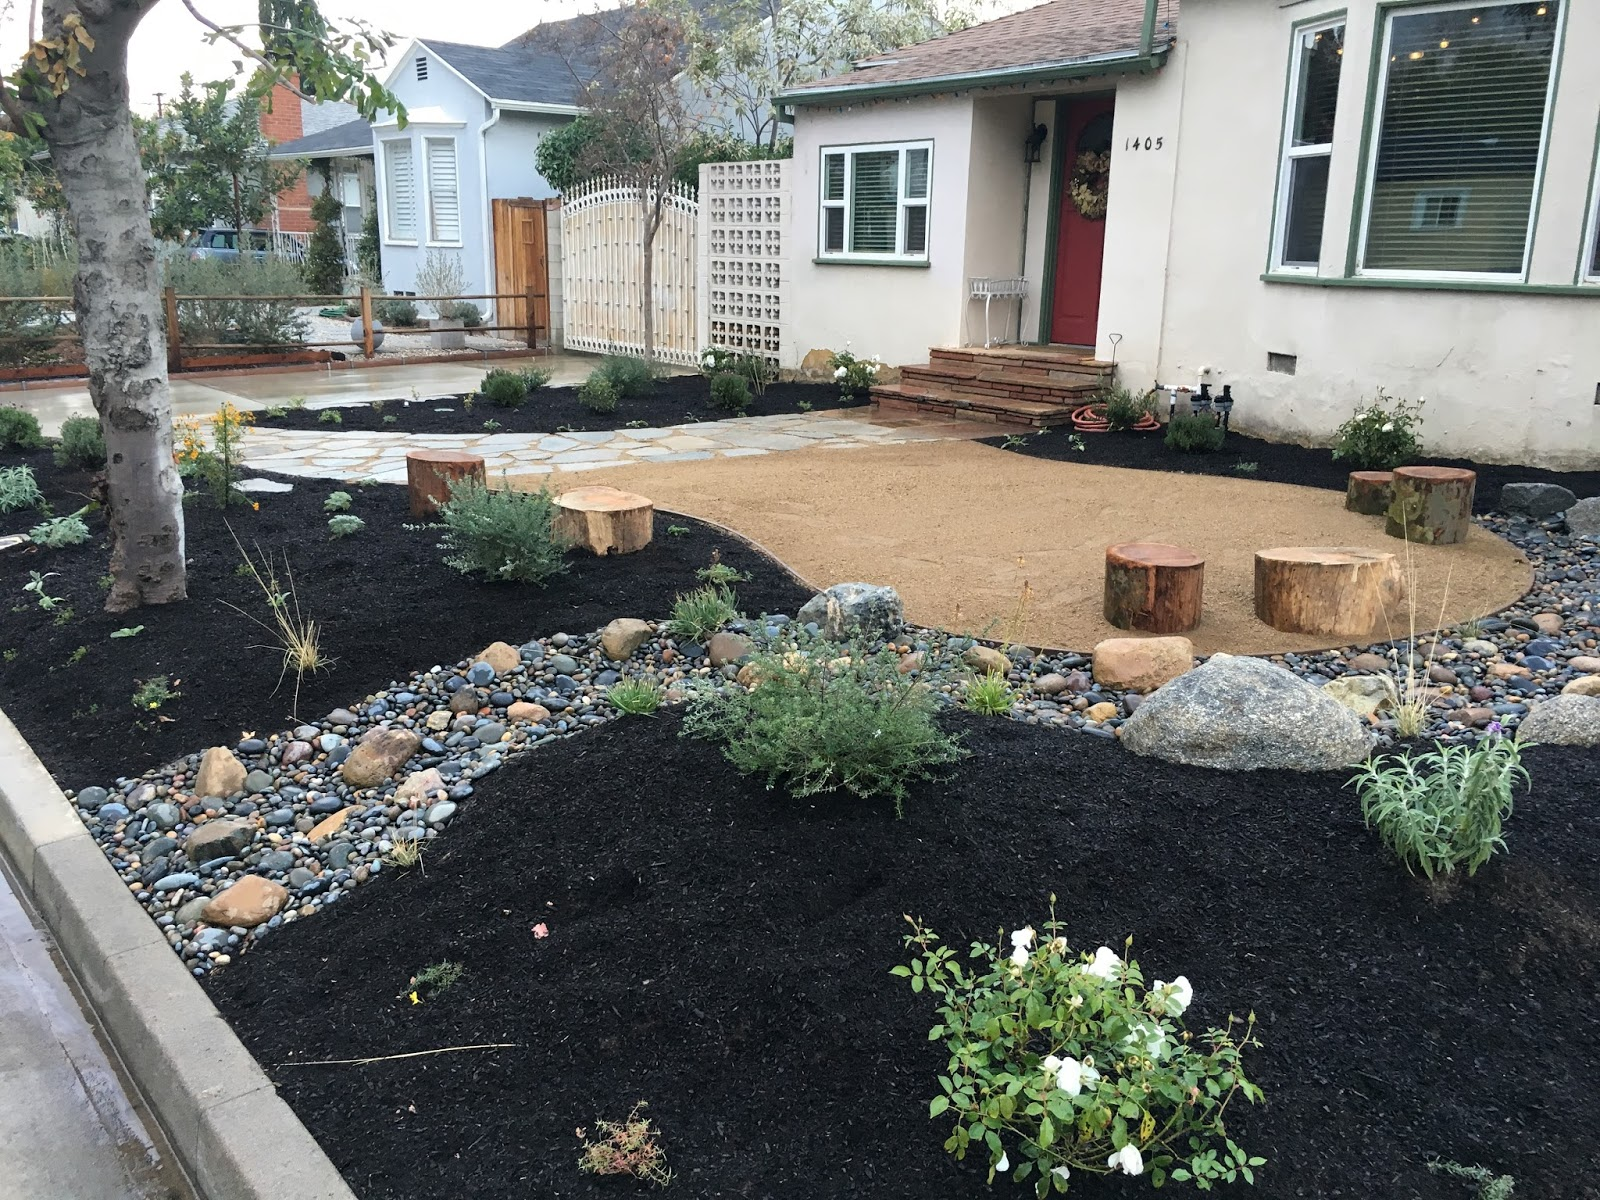 Landscaping Muddy Yard : Fairy yardmother landscape design